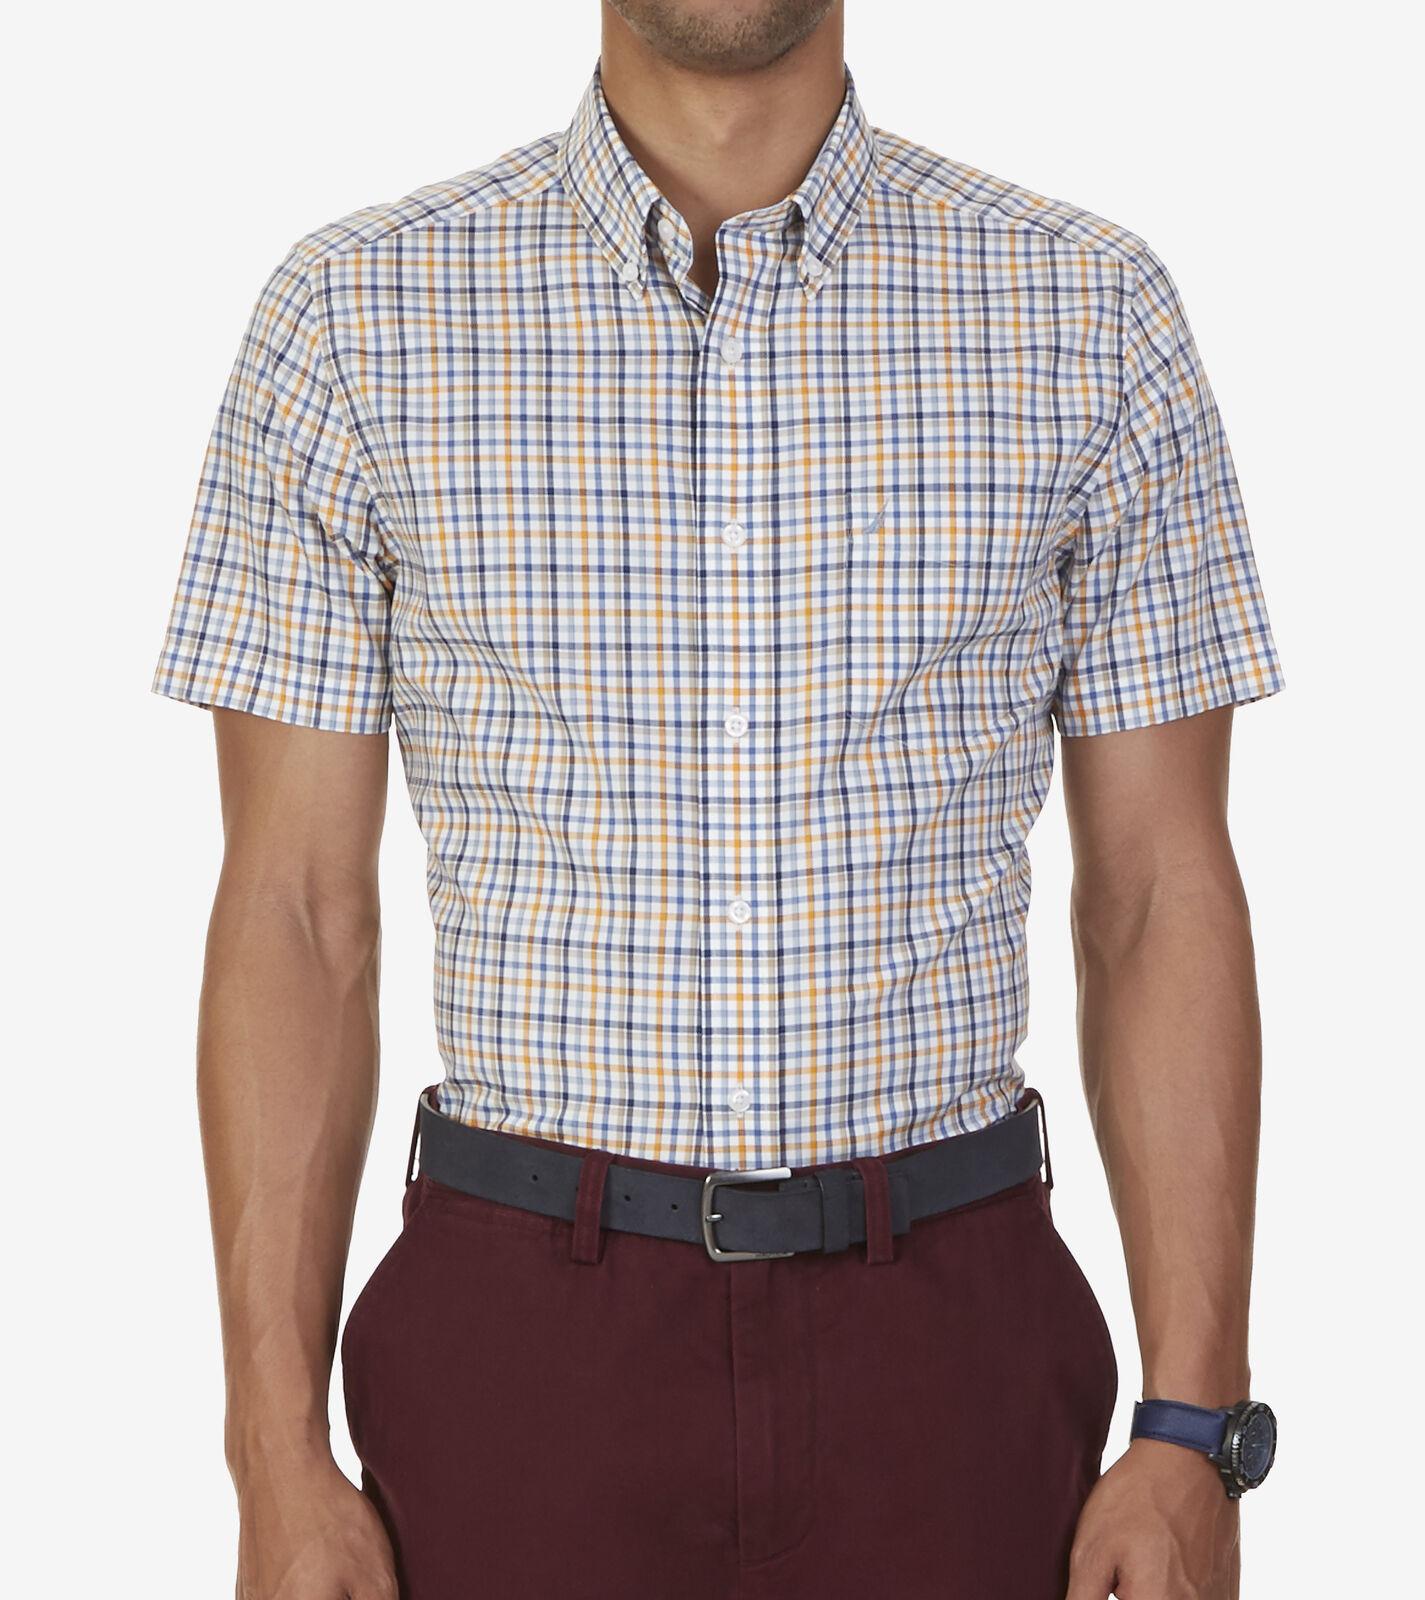 0935113a8 Nautica Wrinkle-resistant, Plaid Woven Shirt, Short Sleeves, Sail White